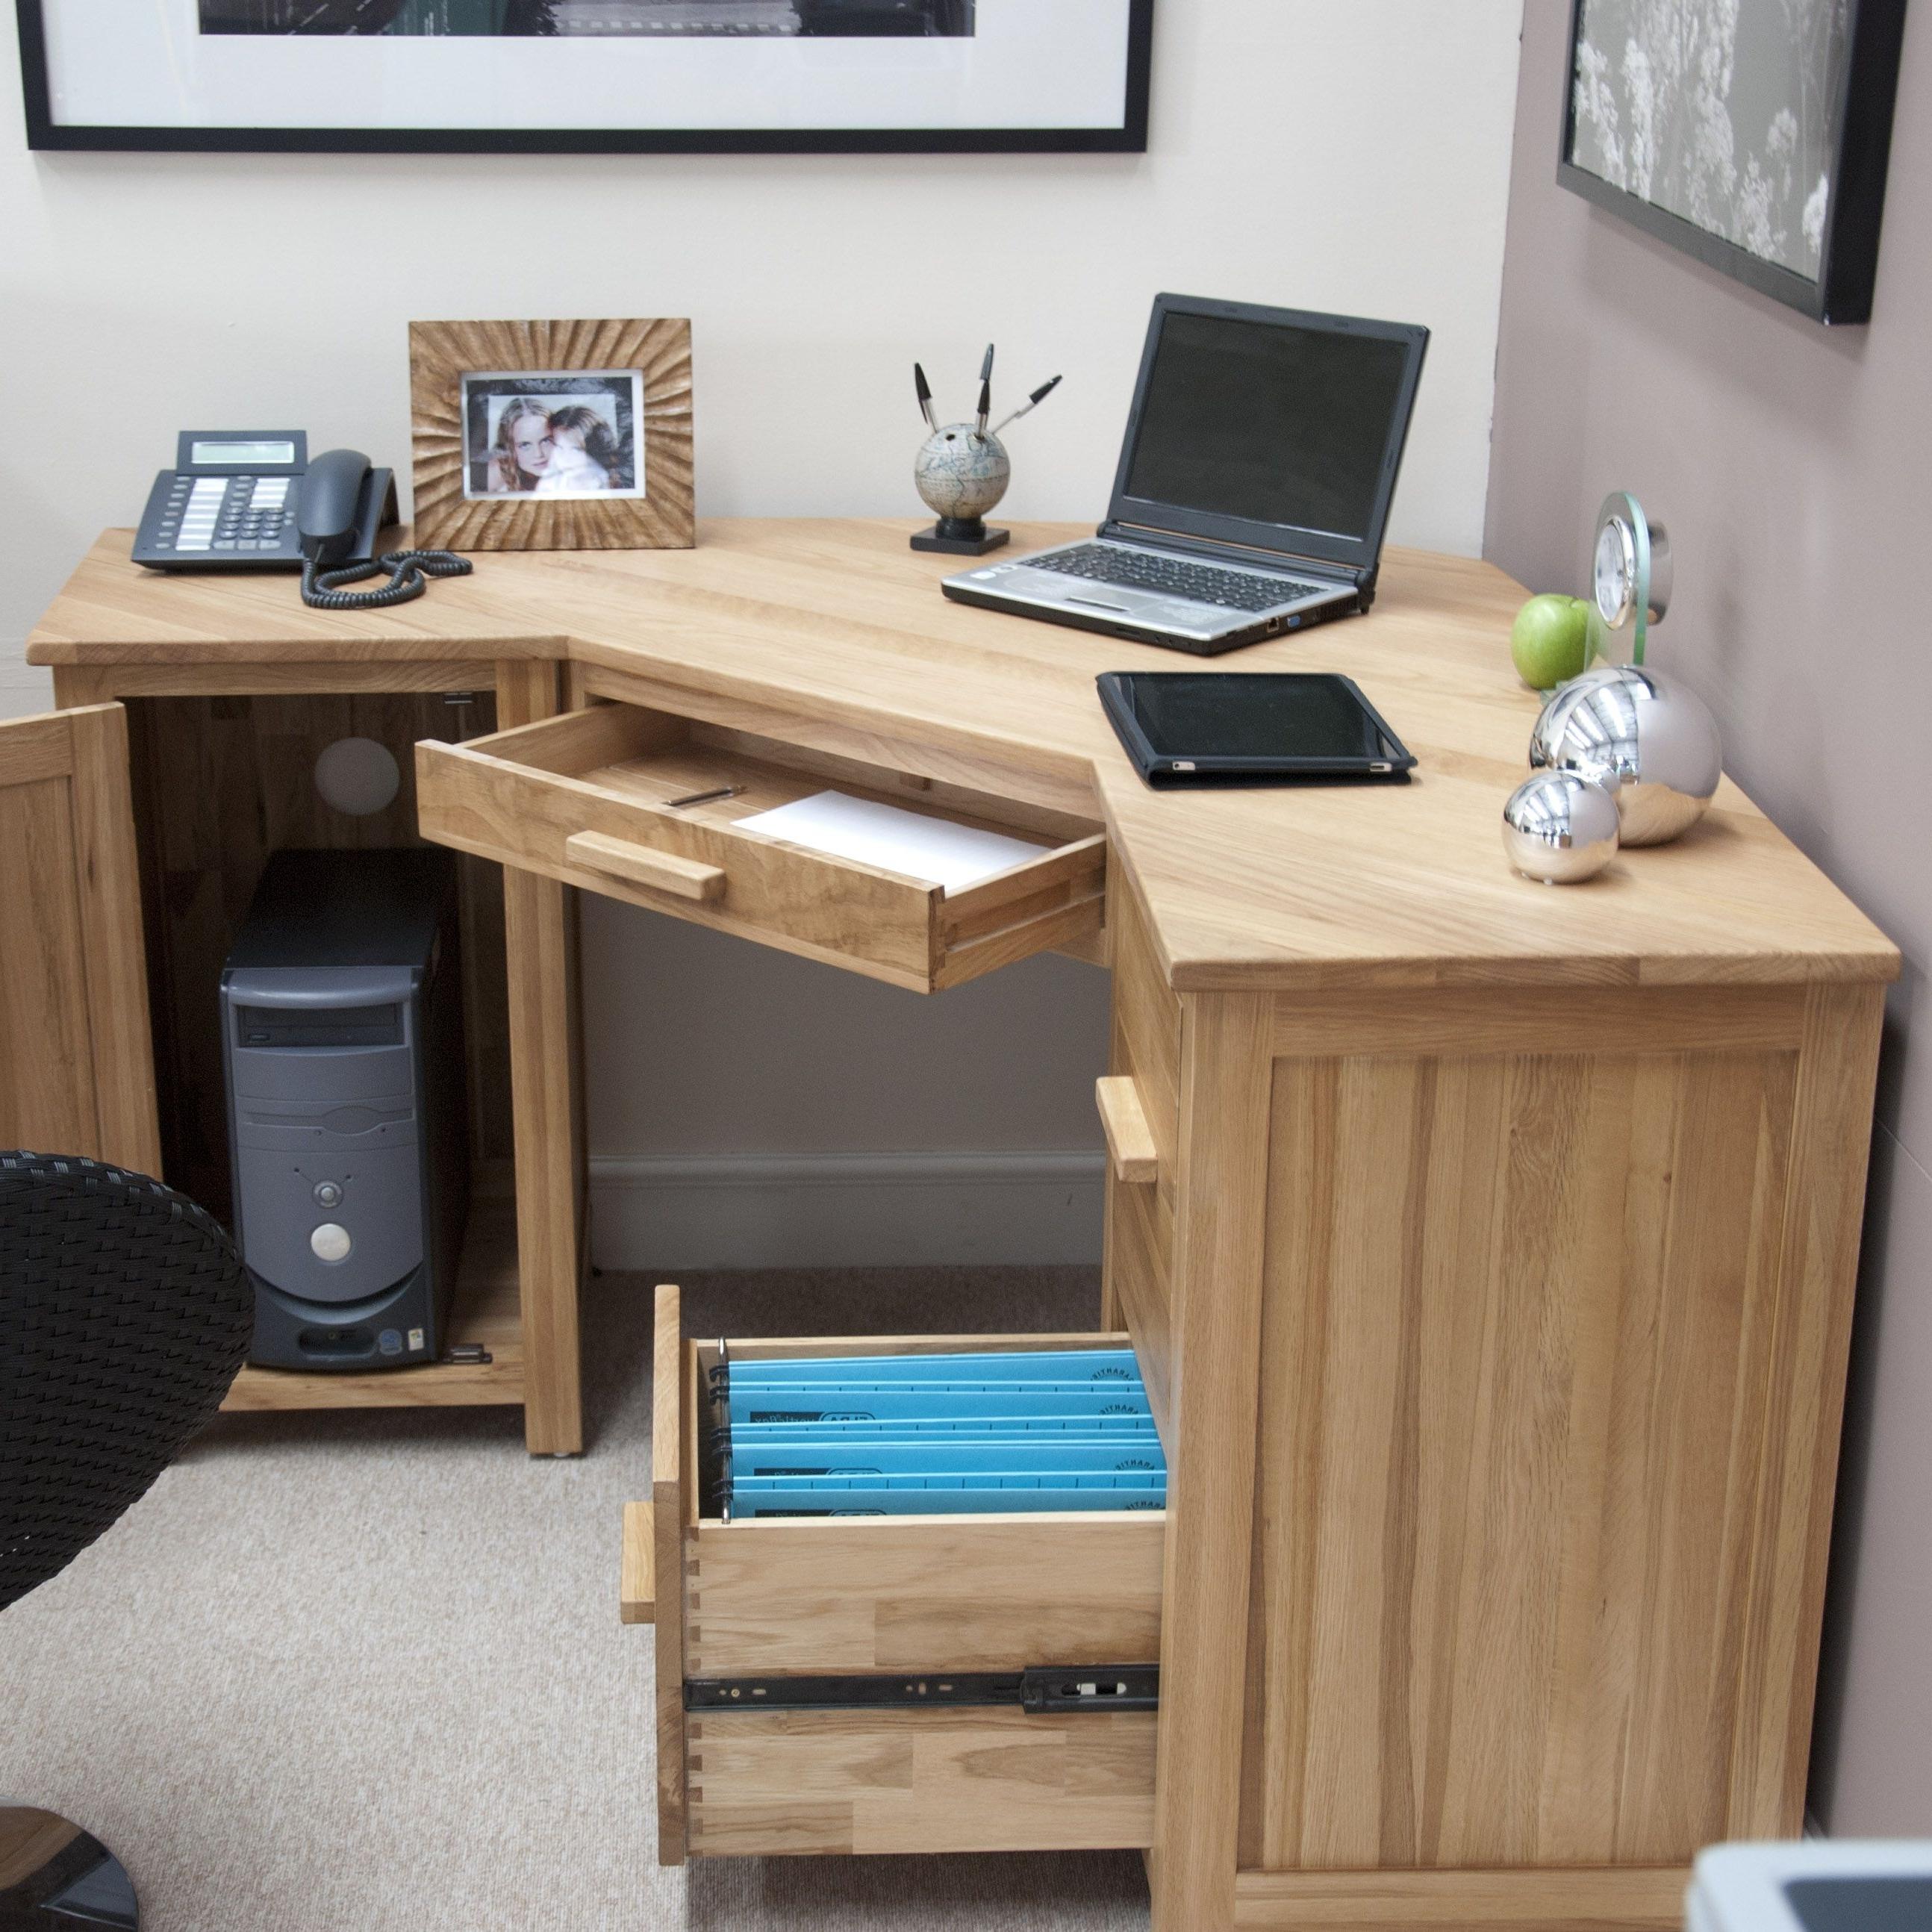 23+ Diy Computer Desk Ideas That Make More Spirit Work (View 1 of 20)